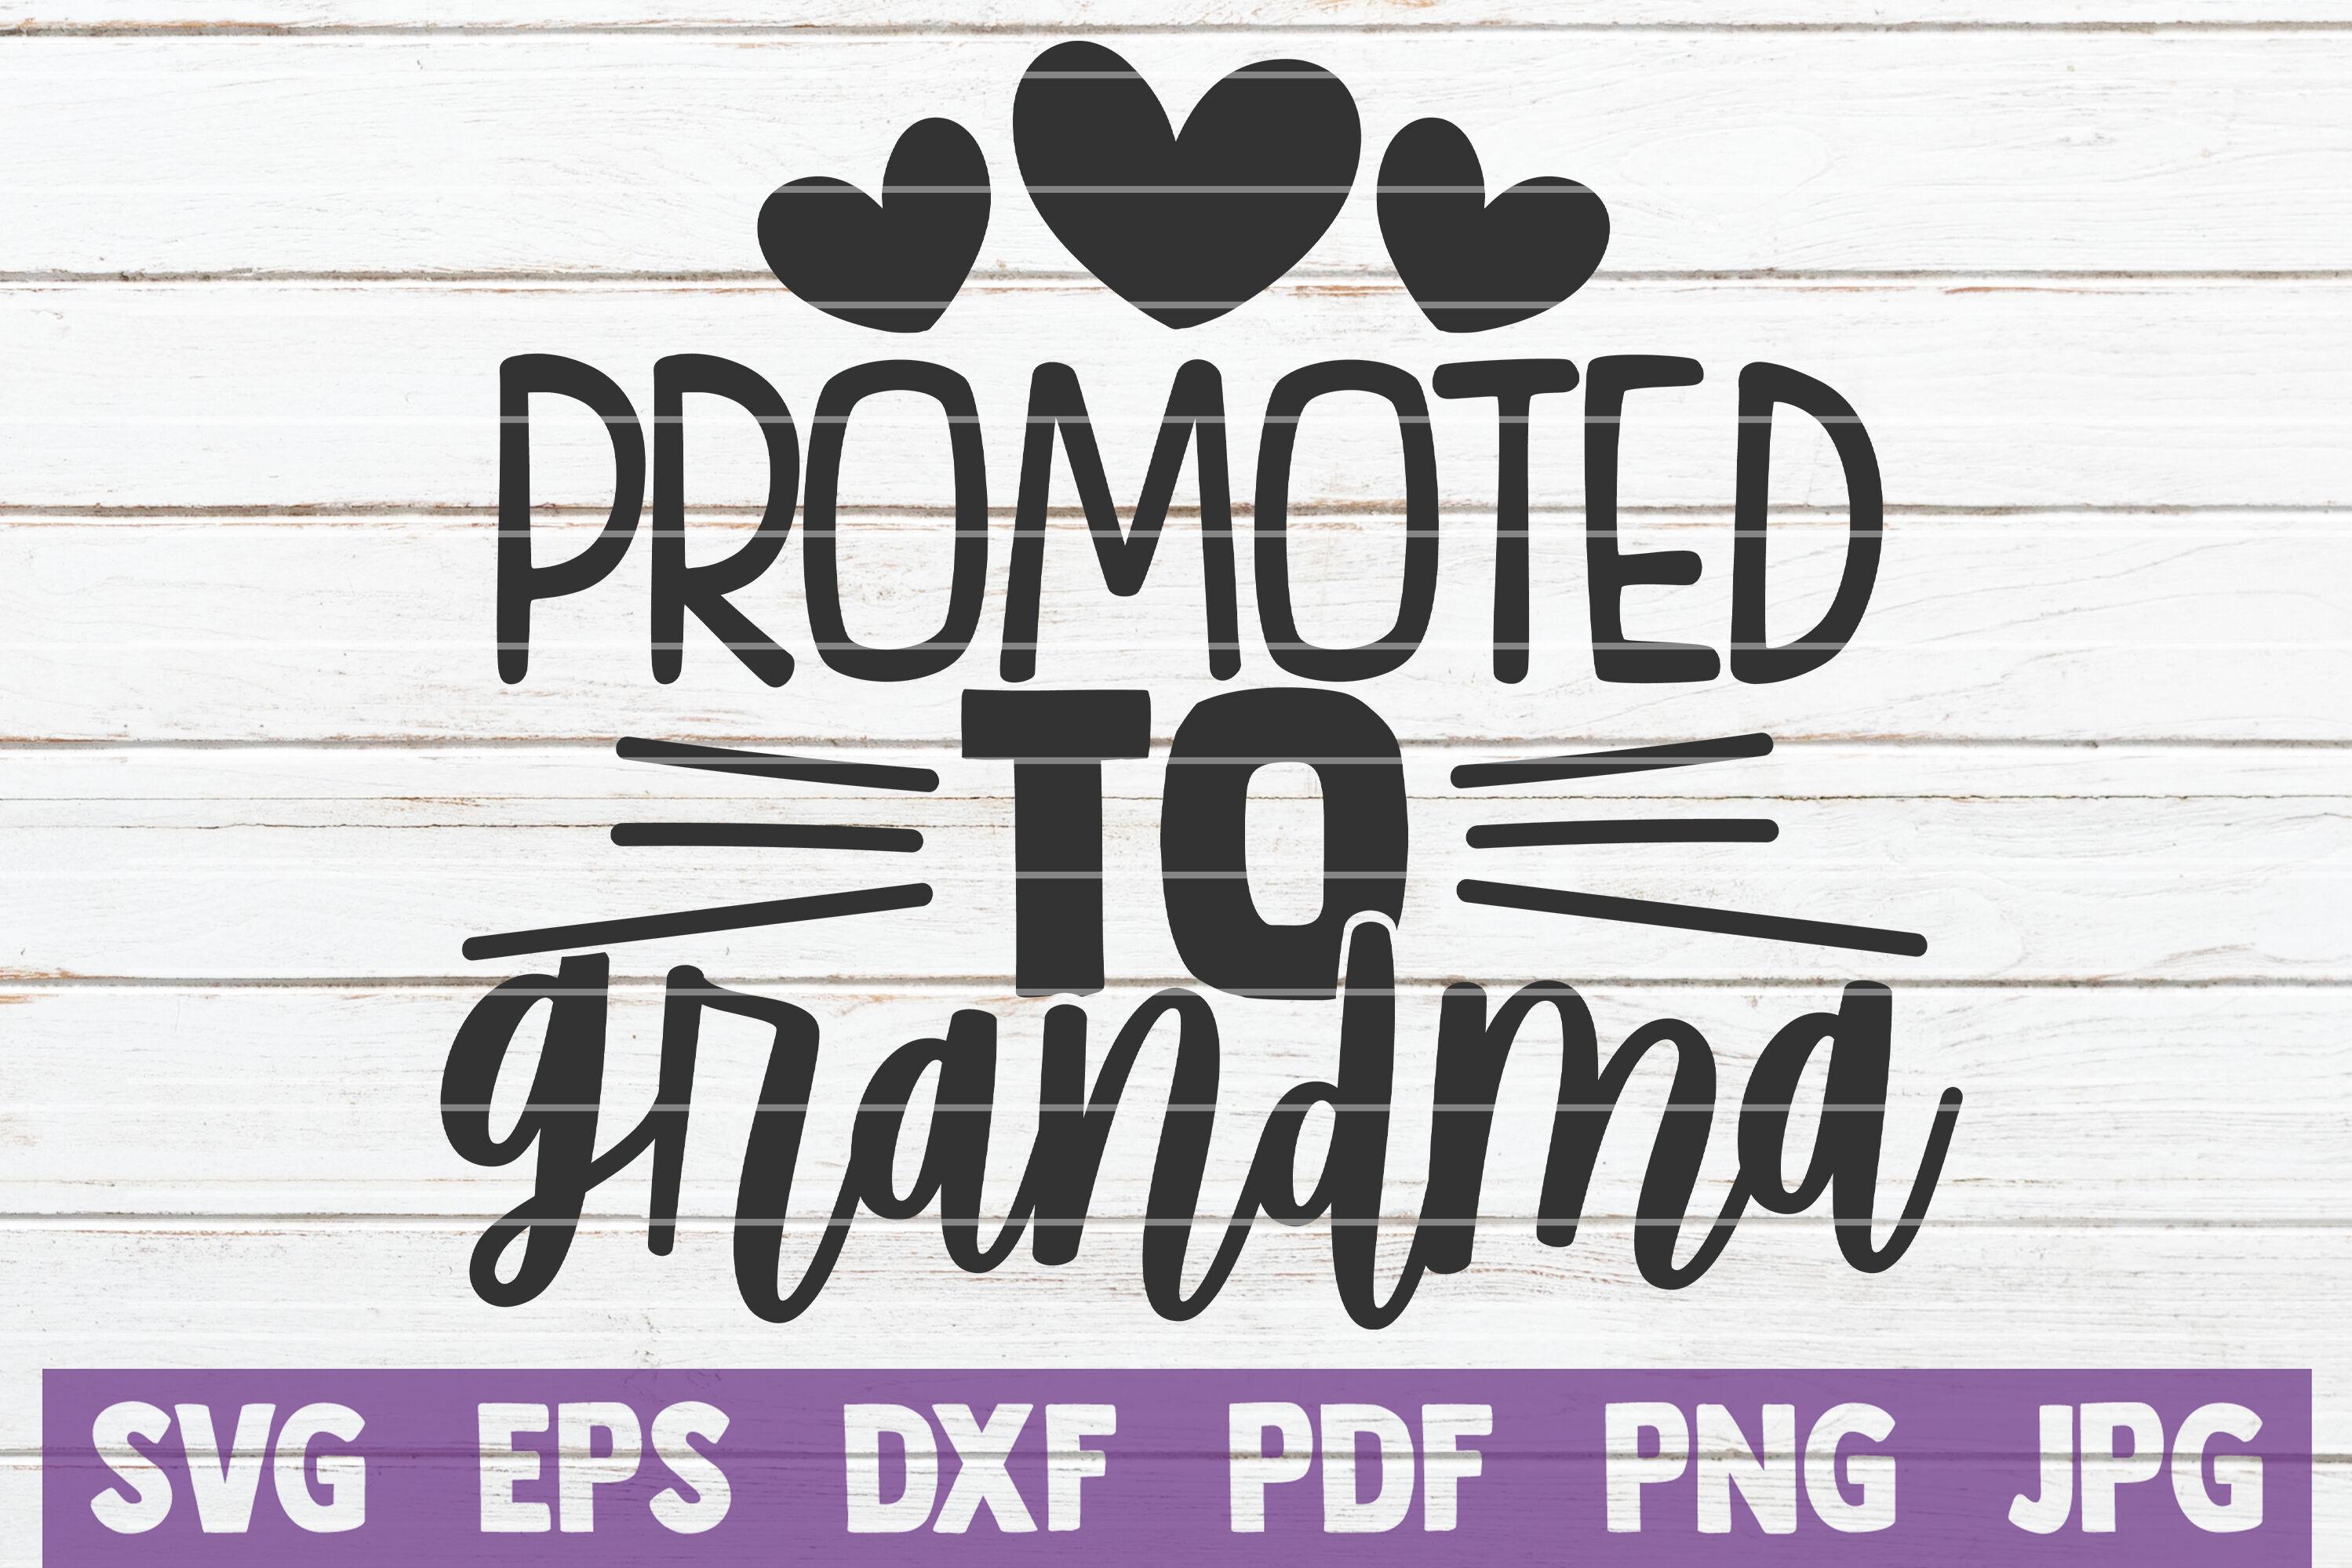 Grandma Svg Bundle Funny Grandma Quotes Svg Cut Files By